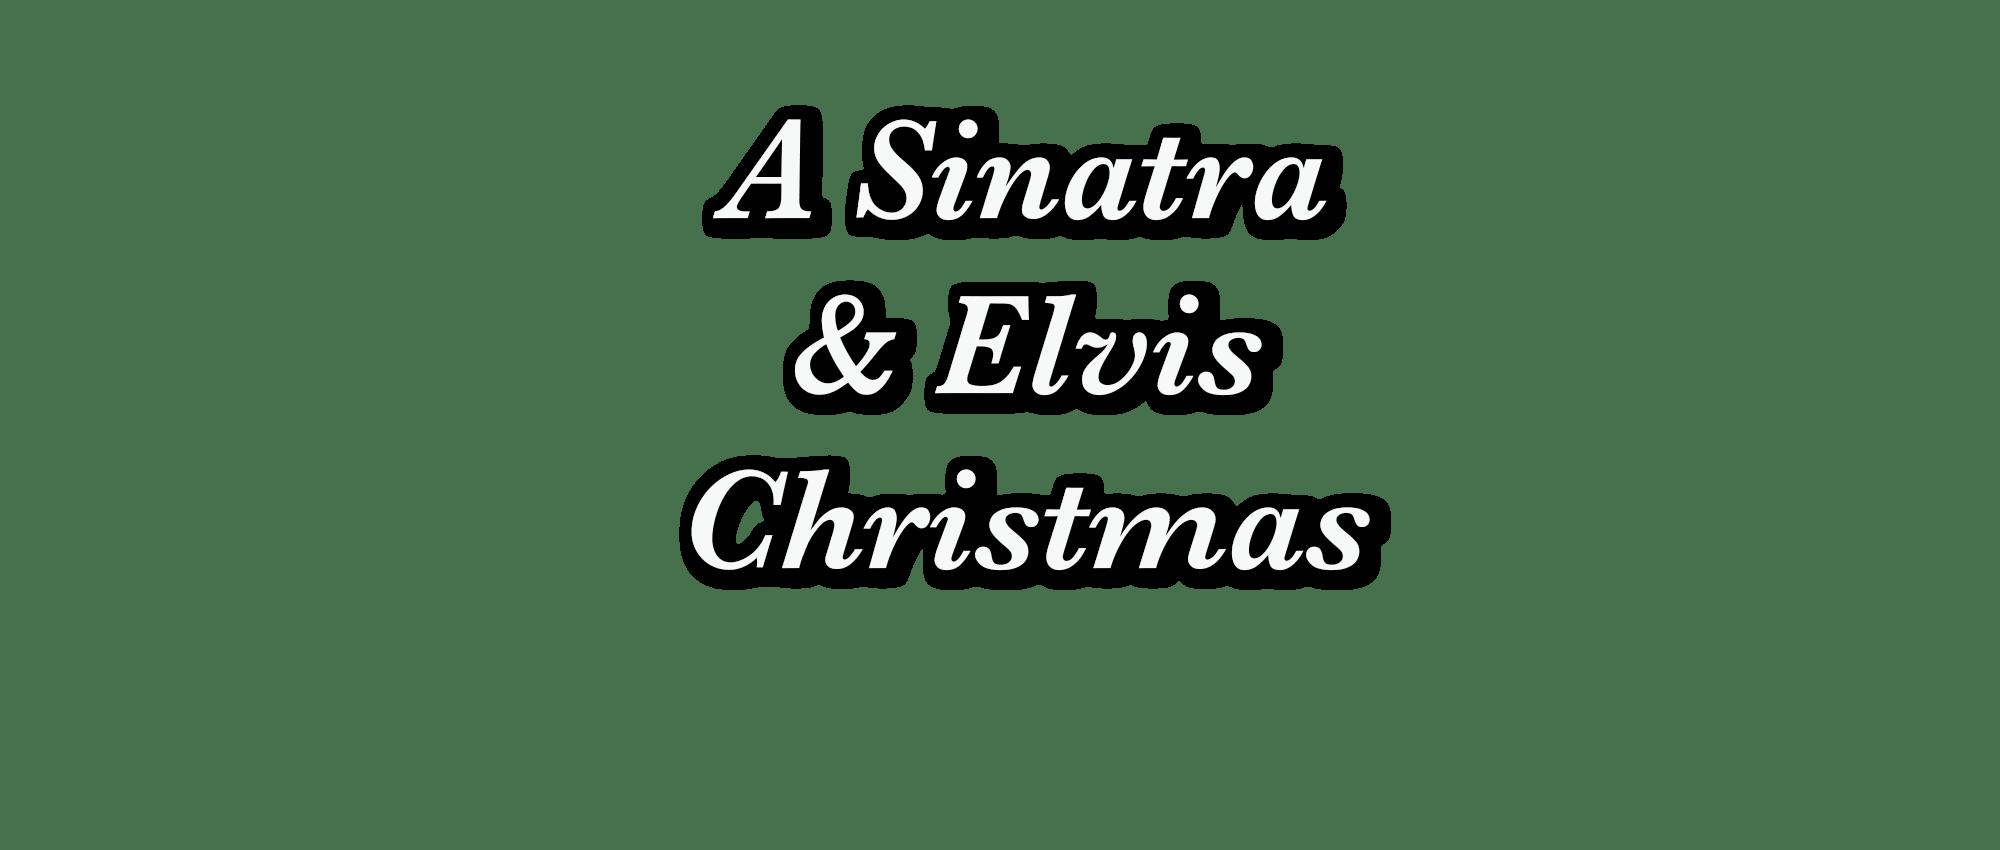 A Sinatra & Elvis Christmas